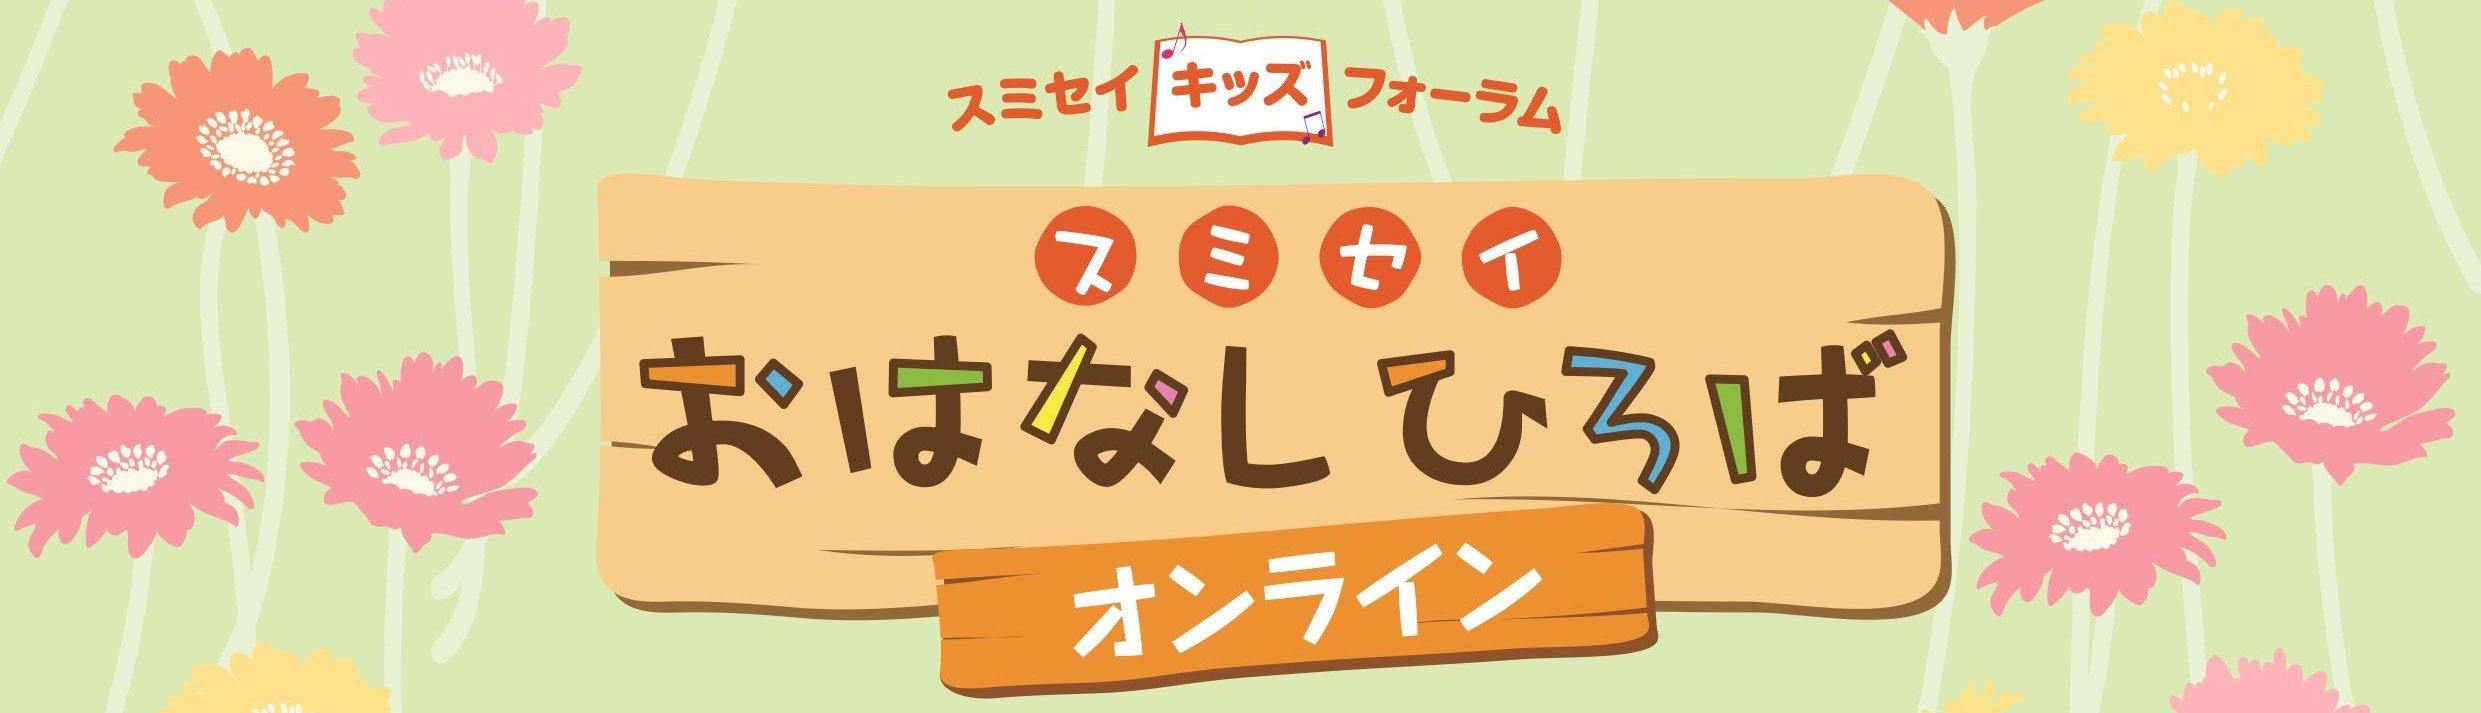 sumisei_online2020_03.jpg